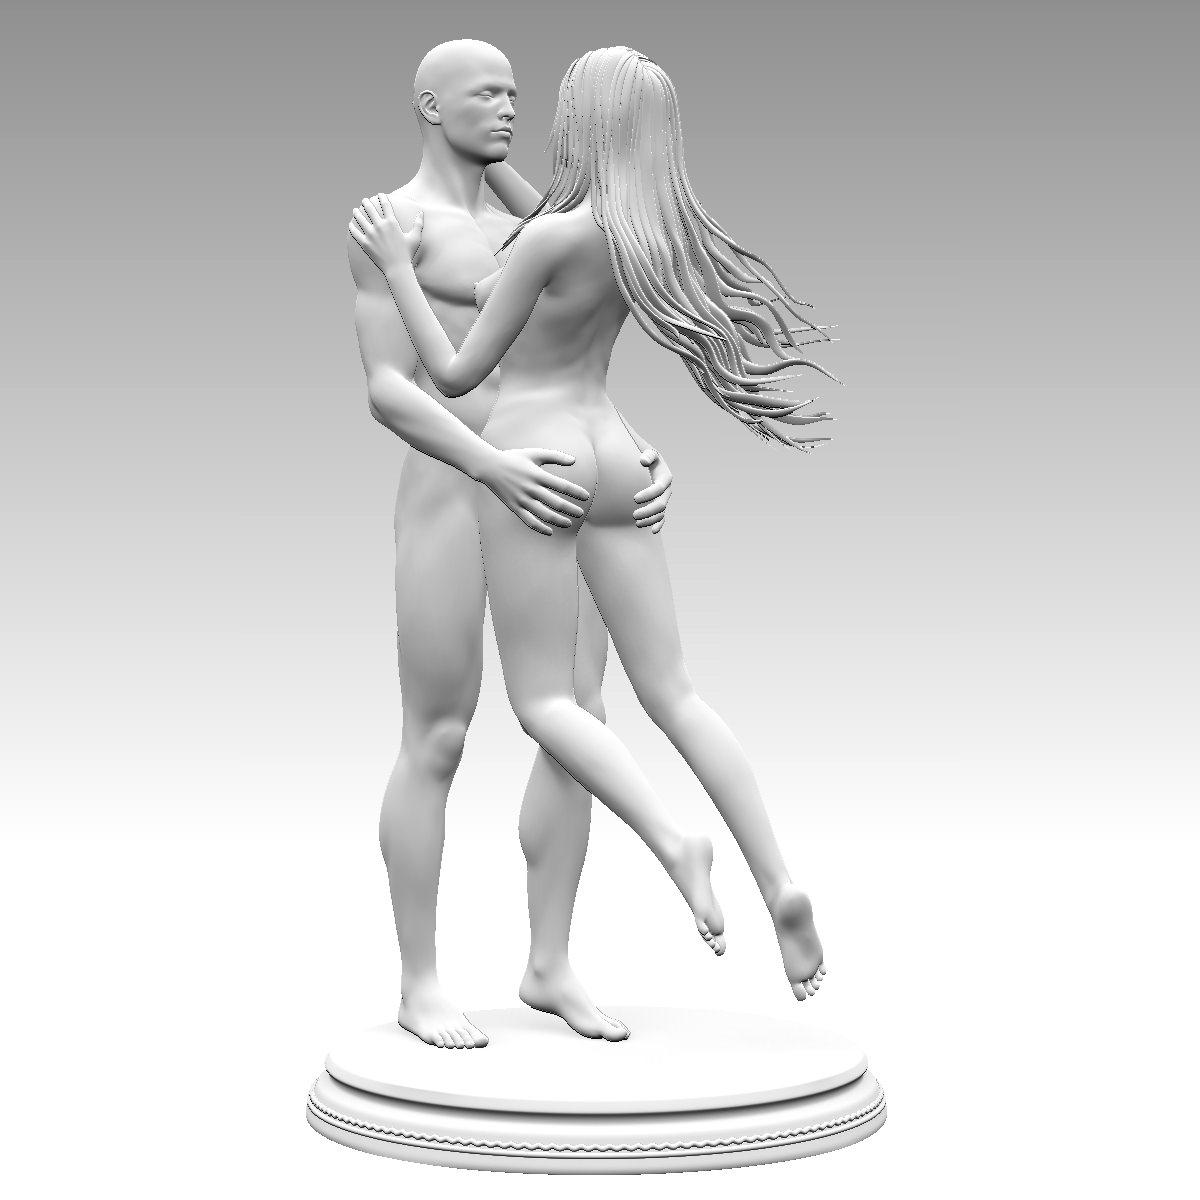 Erotic fashion model from bollywood film industry shanaya - 5 5